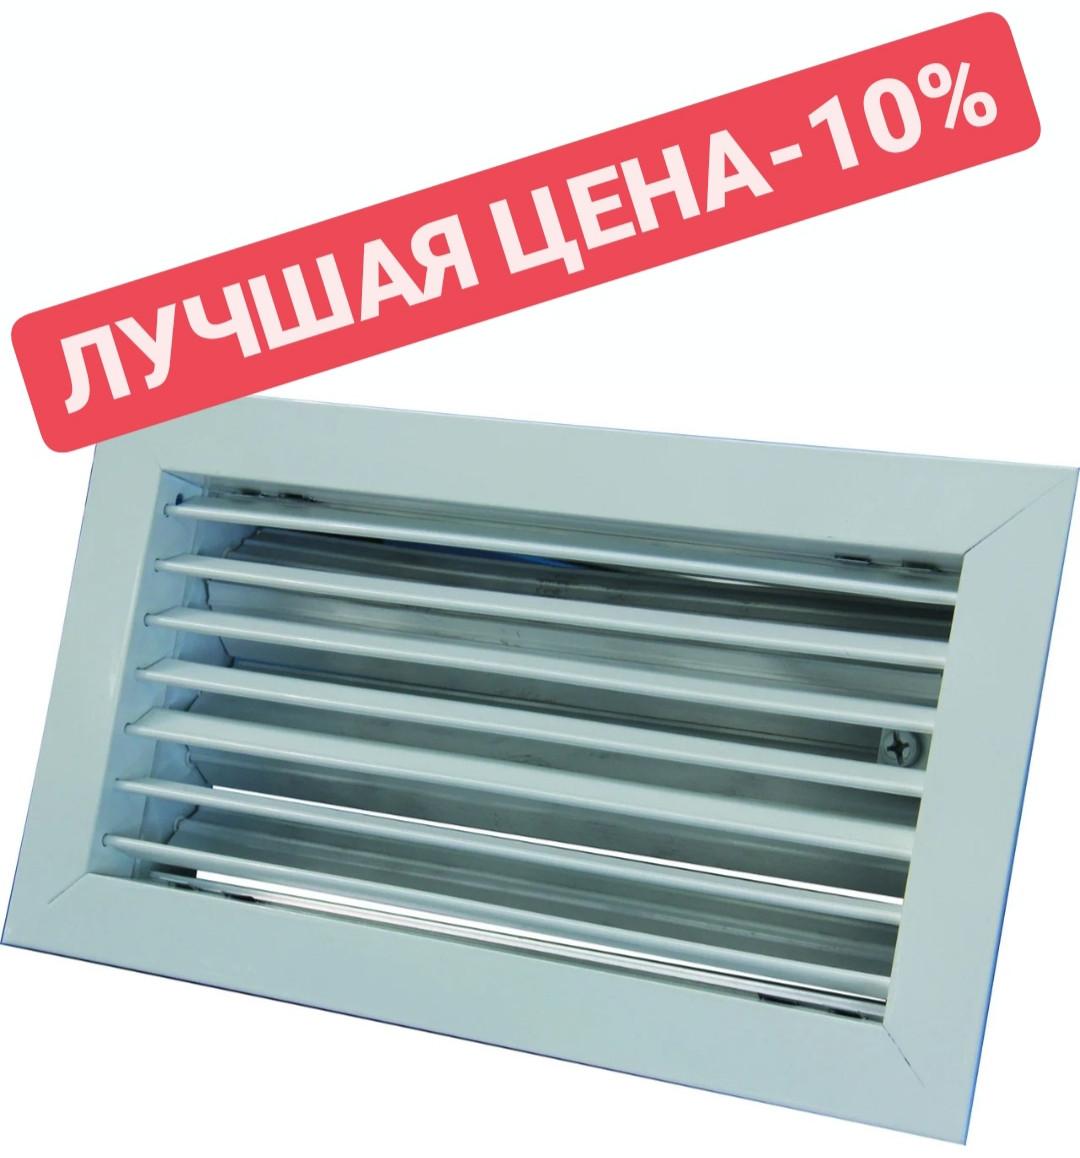 Вентиляционная решетка алюминиевая - фото 1